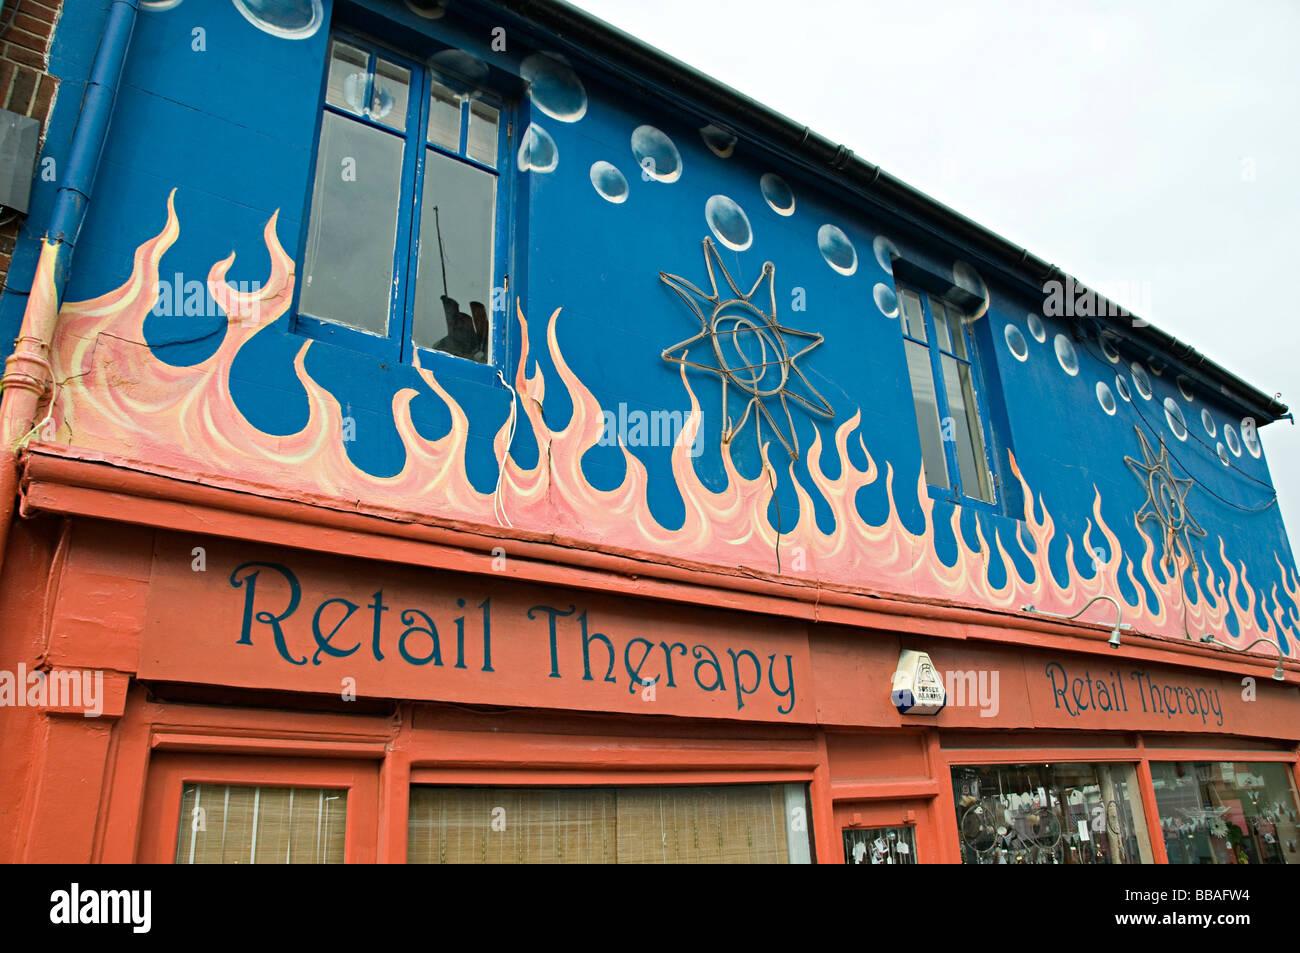 Retail therapy Brighton boutique eco friendly shop - Stock Image